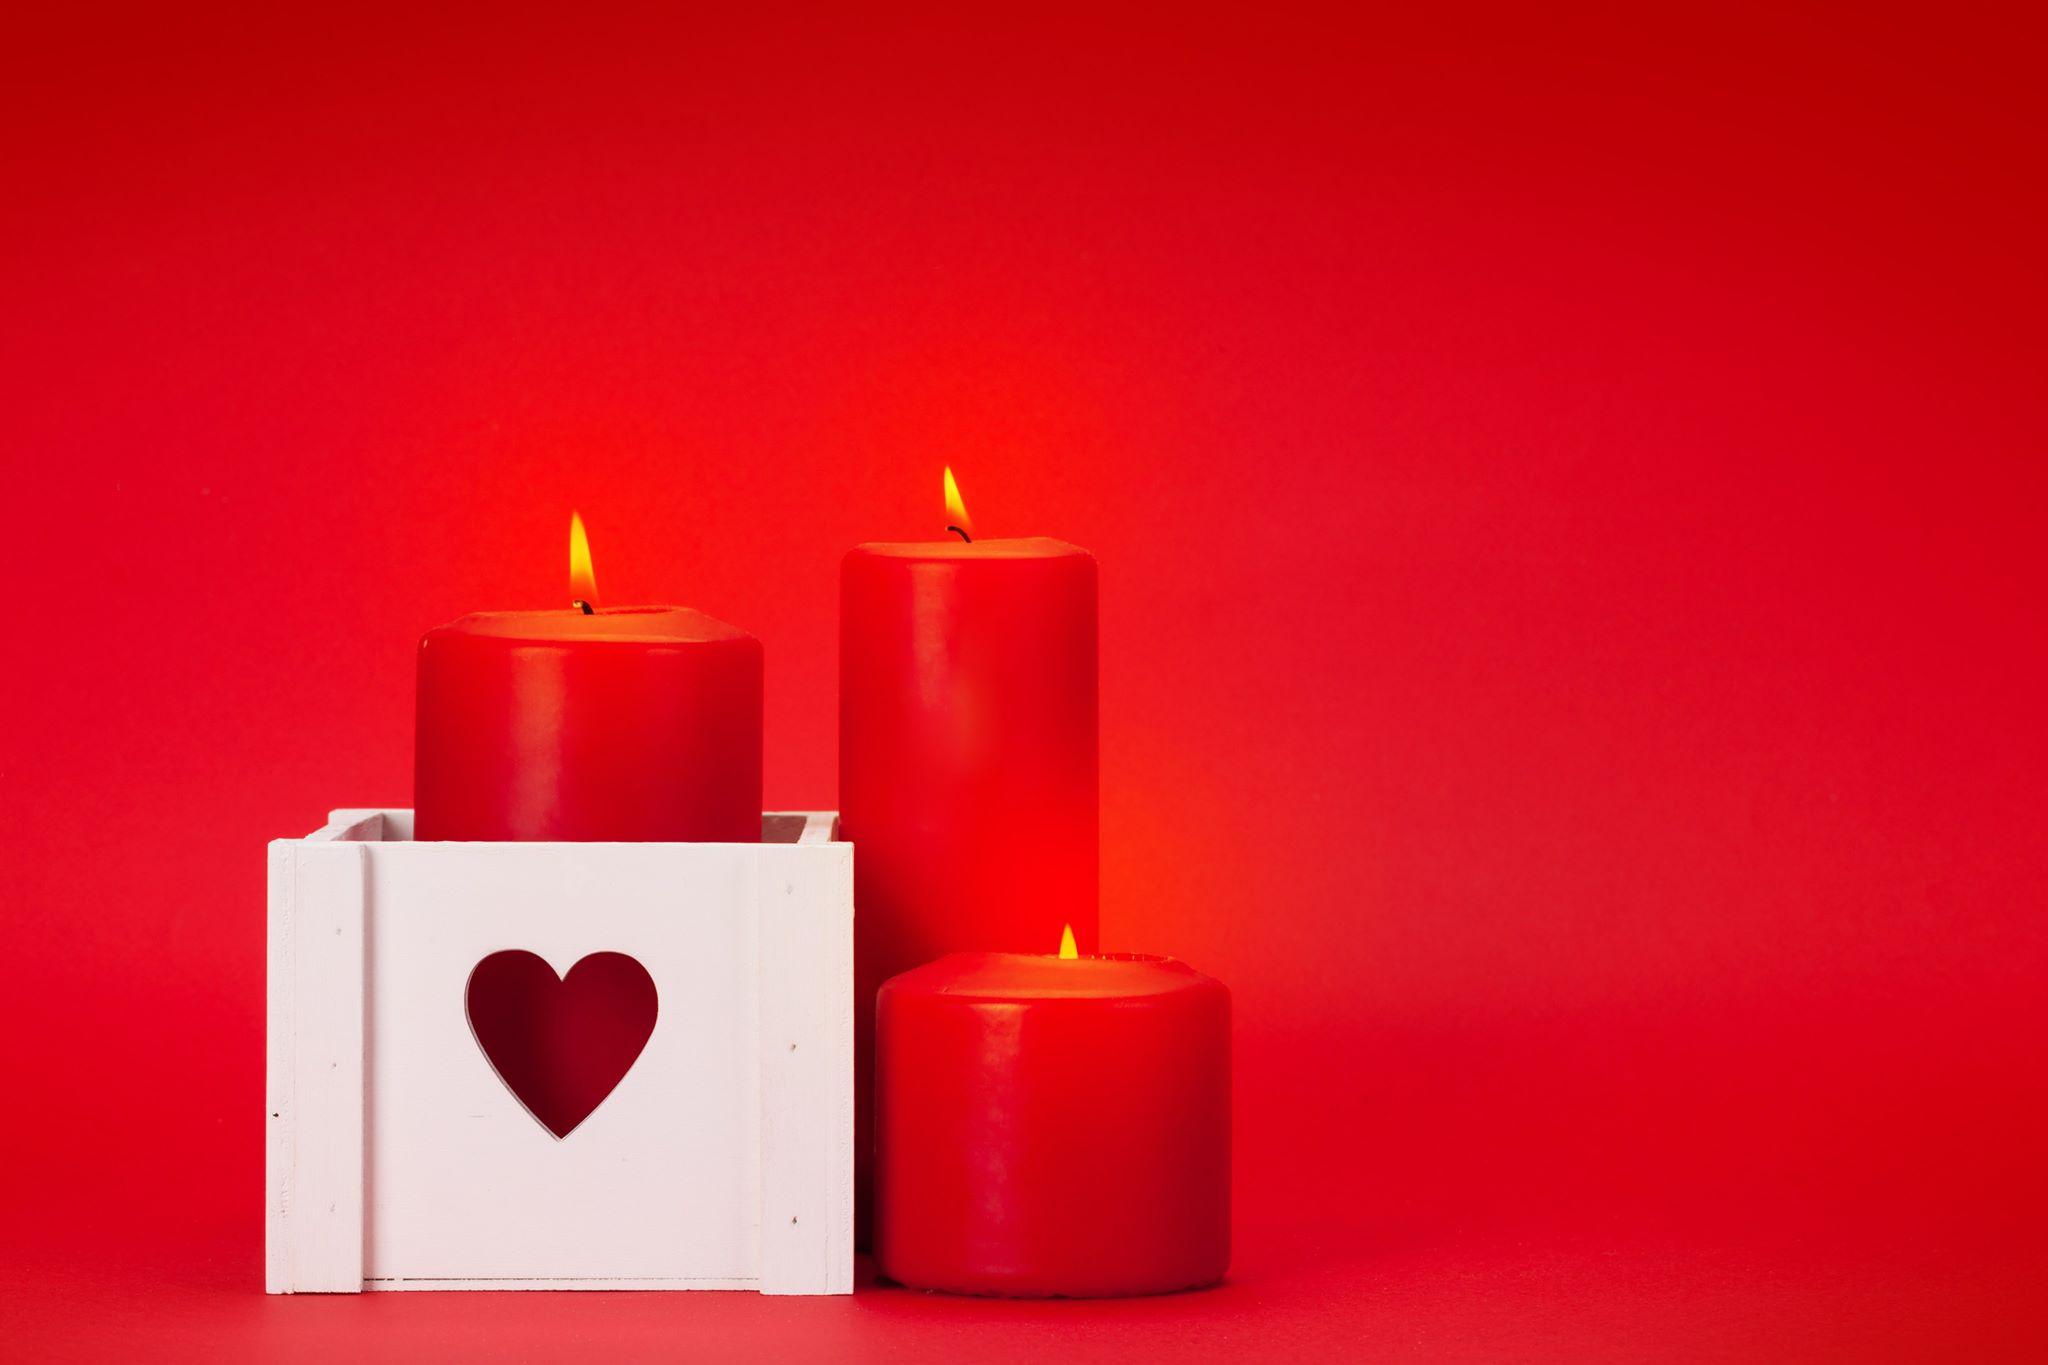 Valentines day images 31 صور عيد الحب